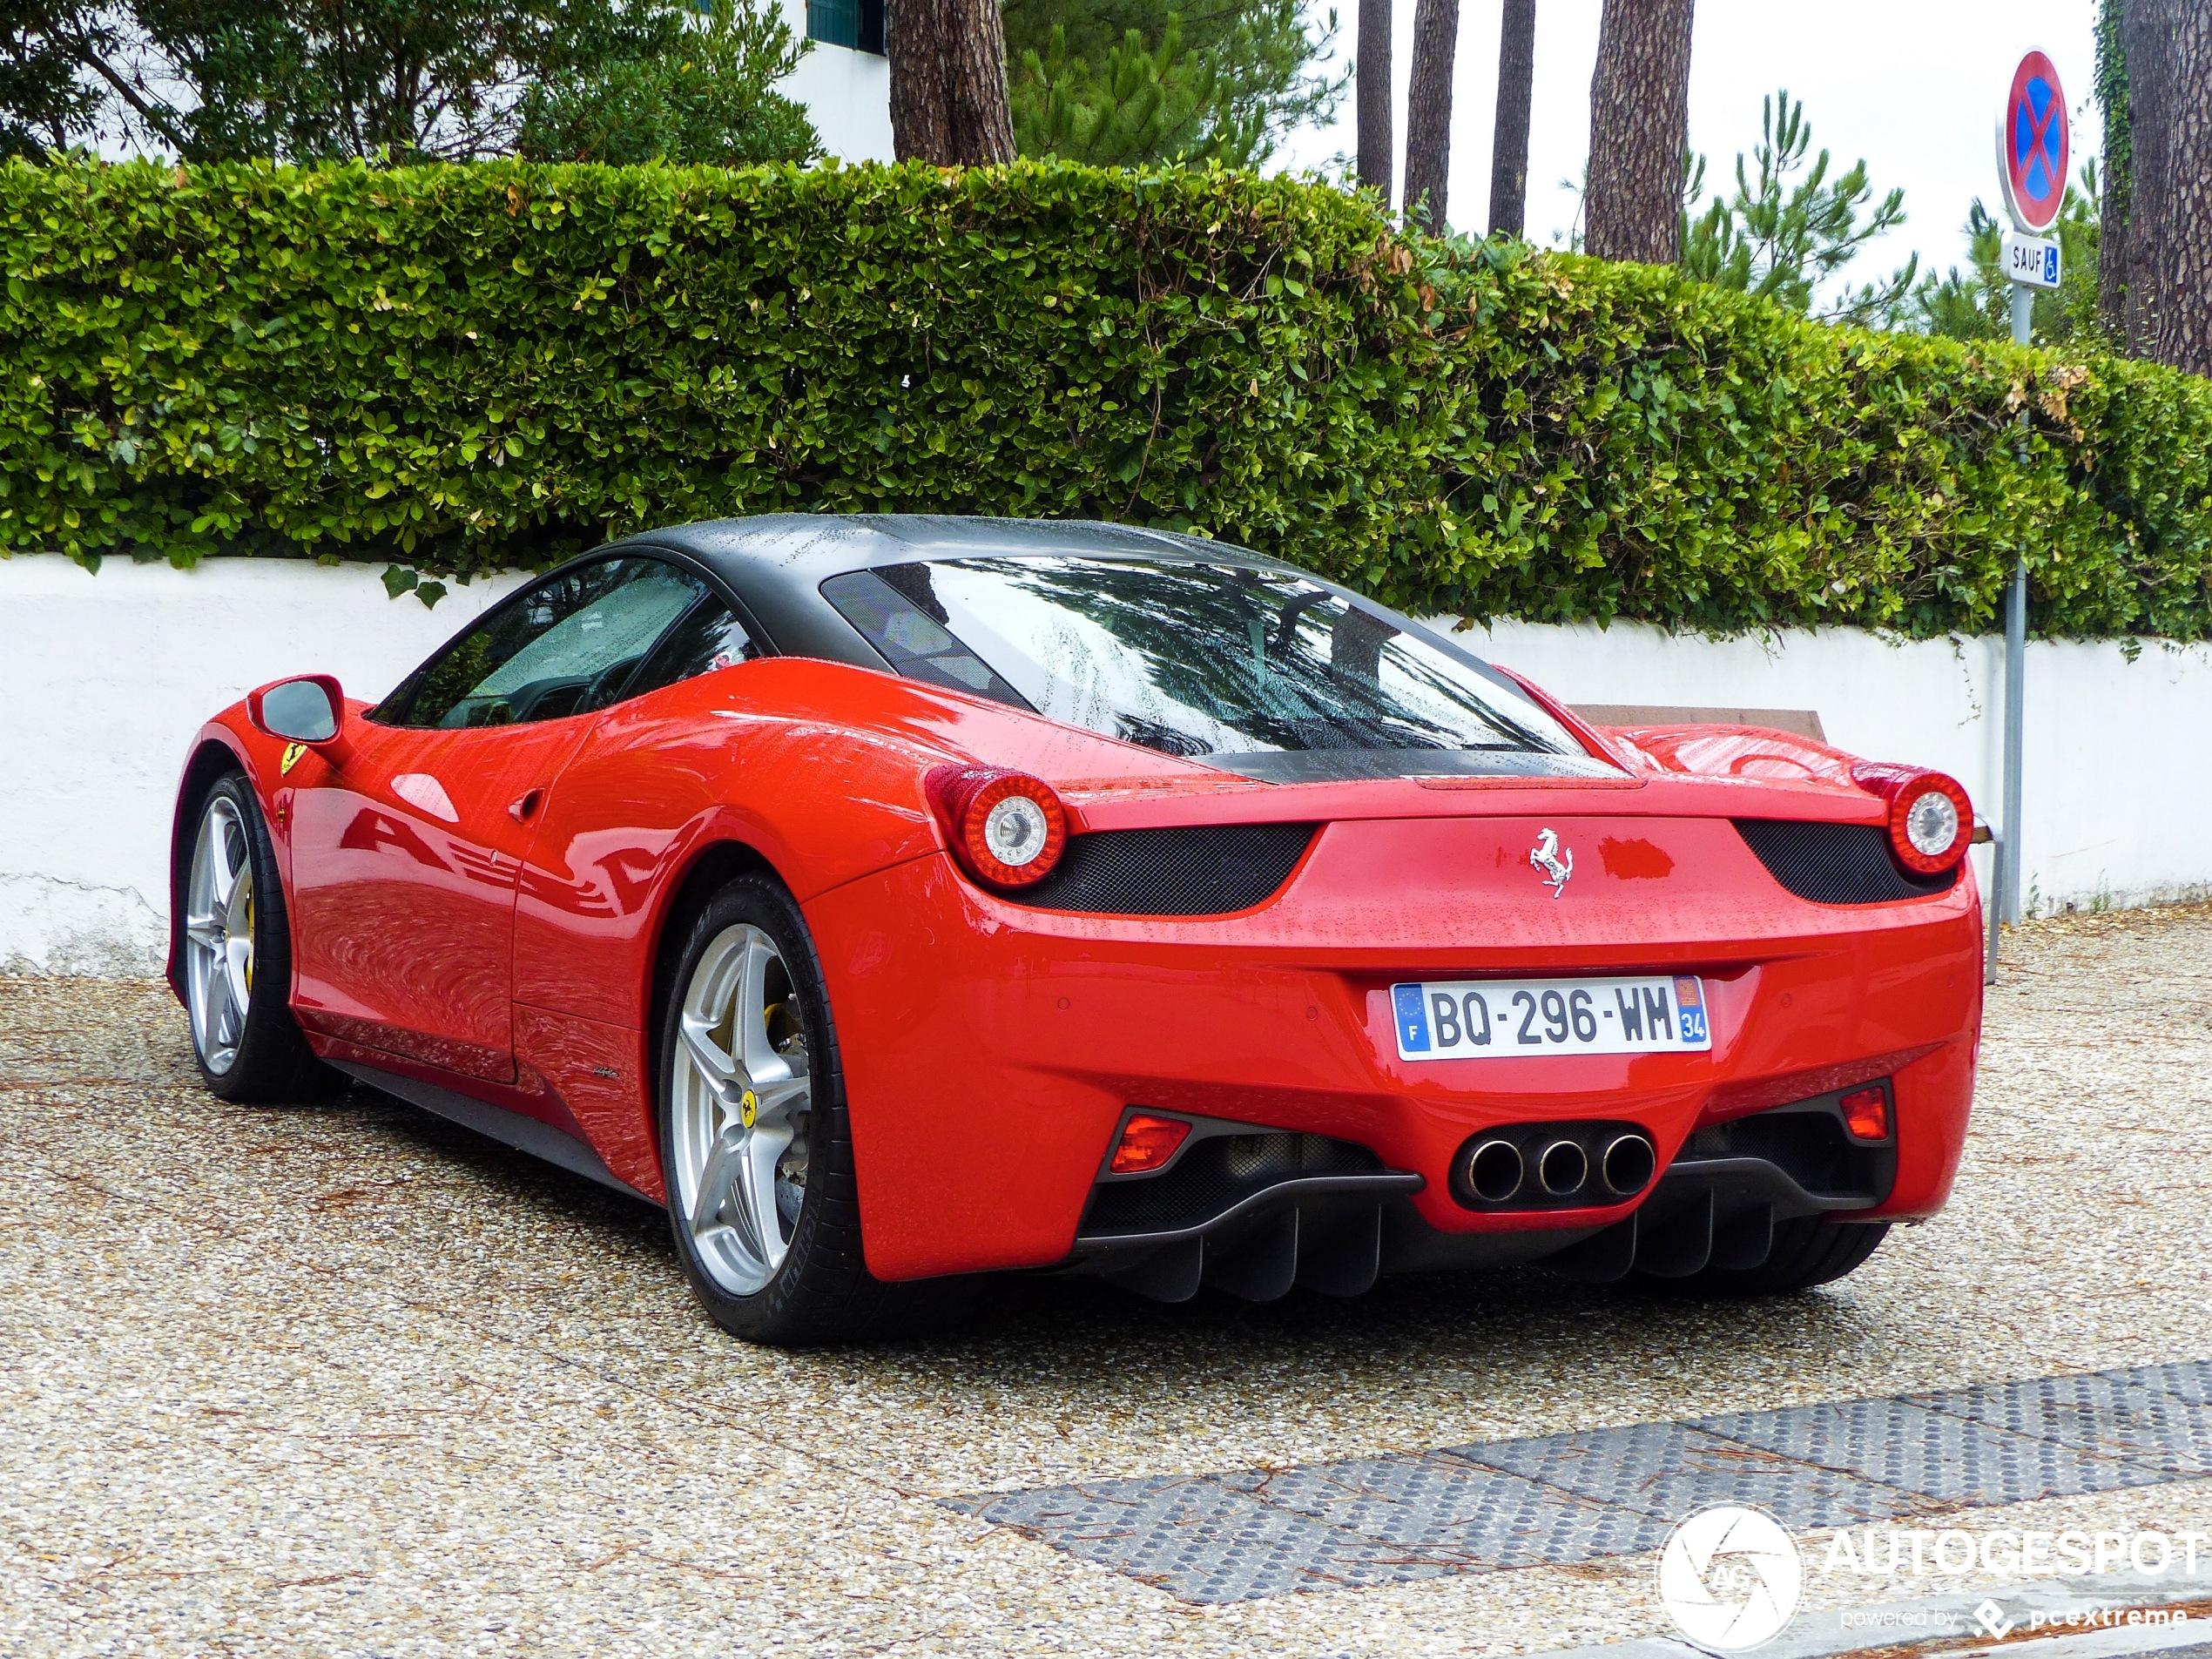 Ferrari 458 Italia 26 M Rz 2020 Autogespot